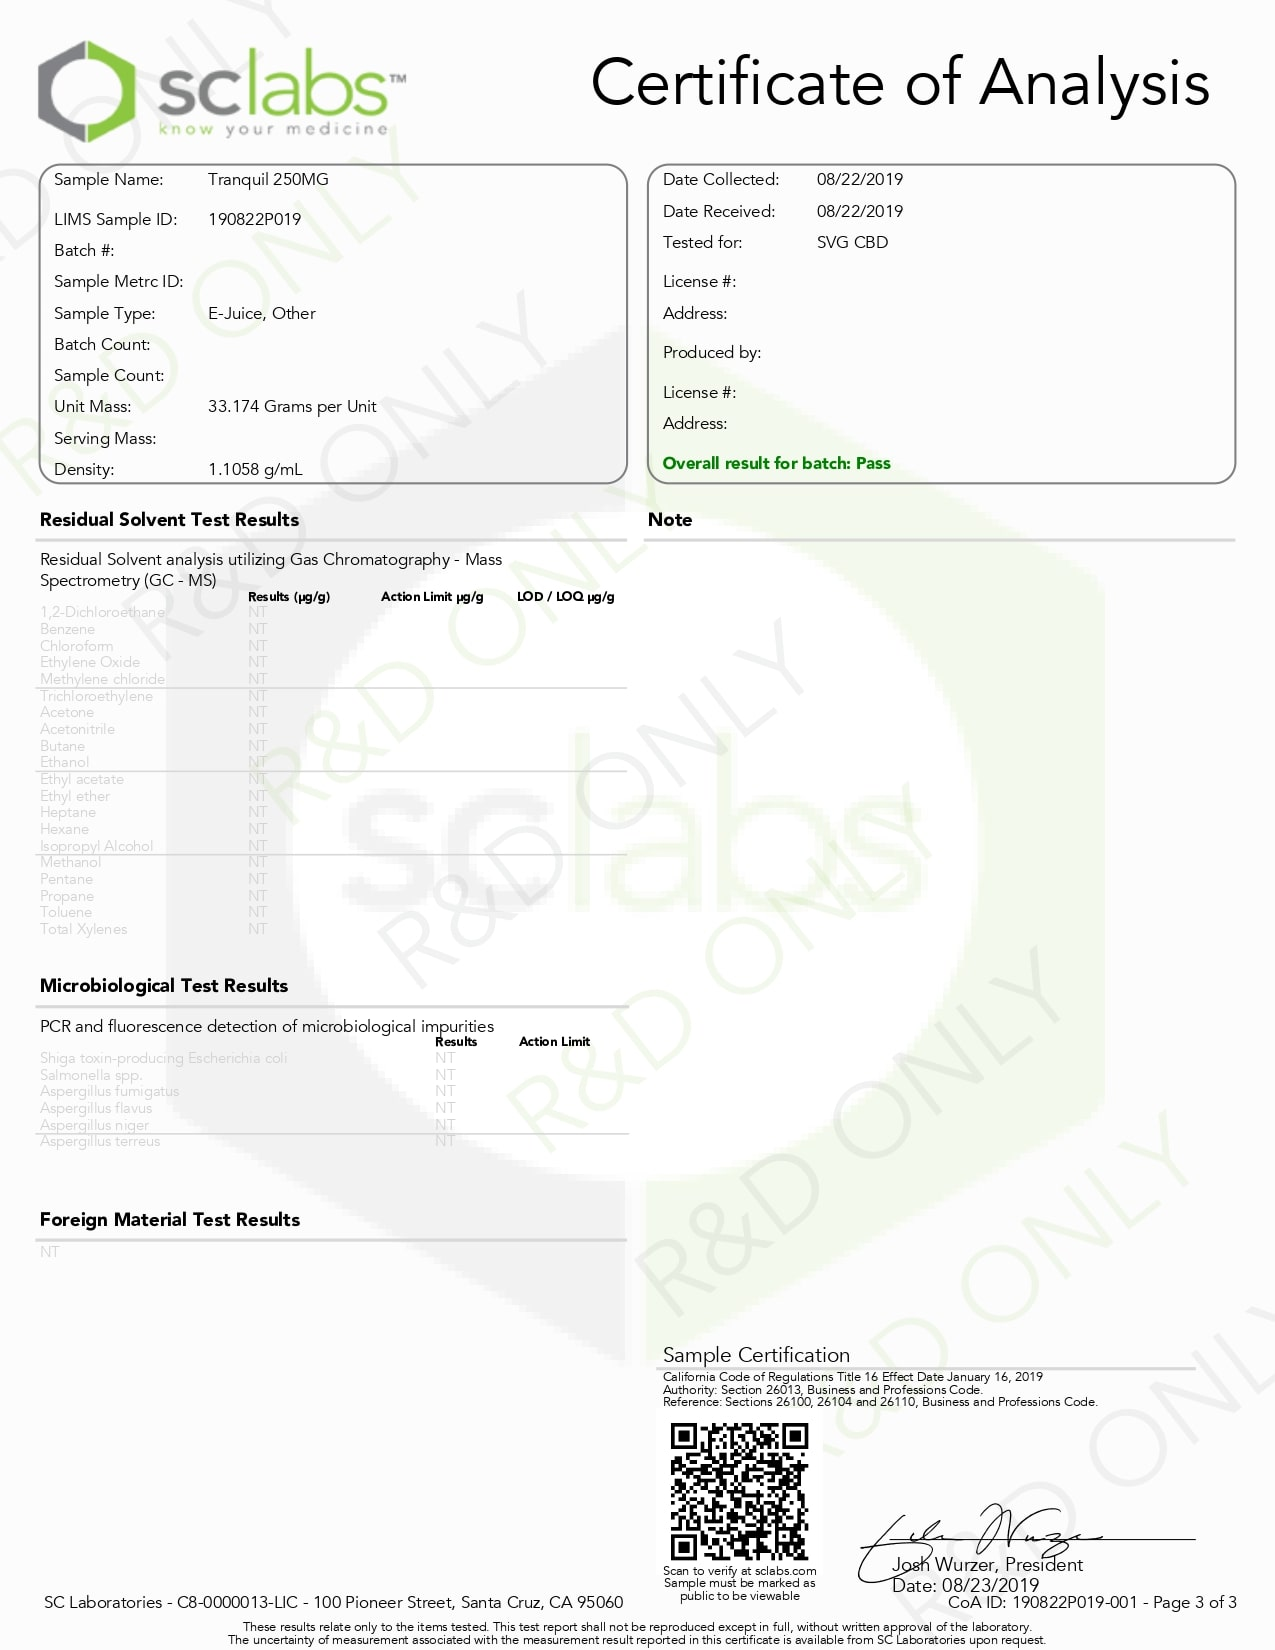 SAVAGE Tranquil CBD Vape Juice 250mg Lab Report